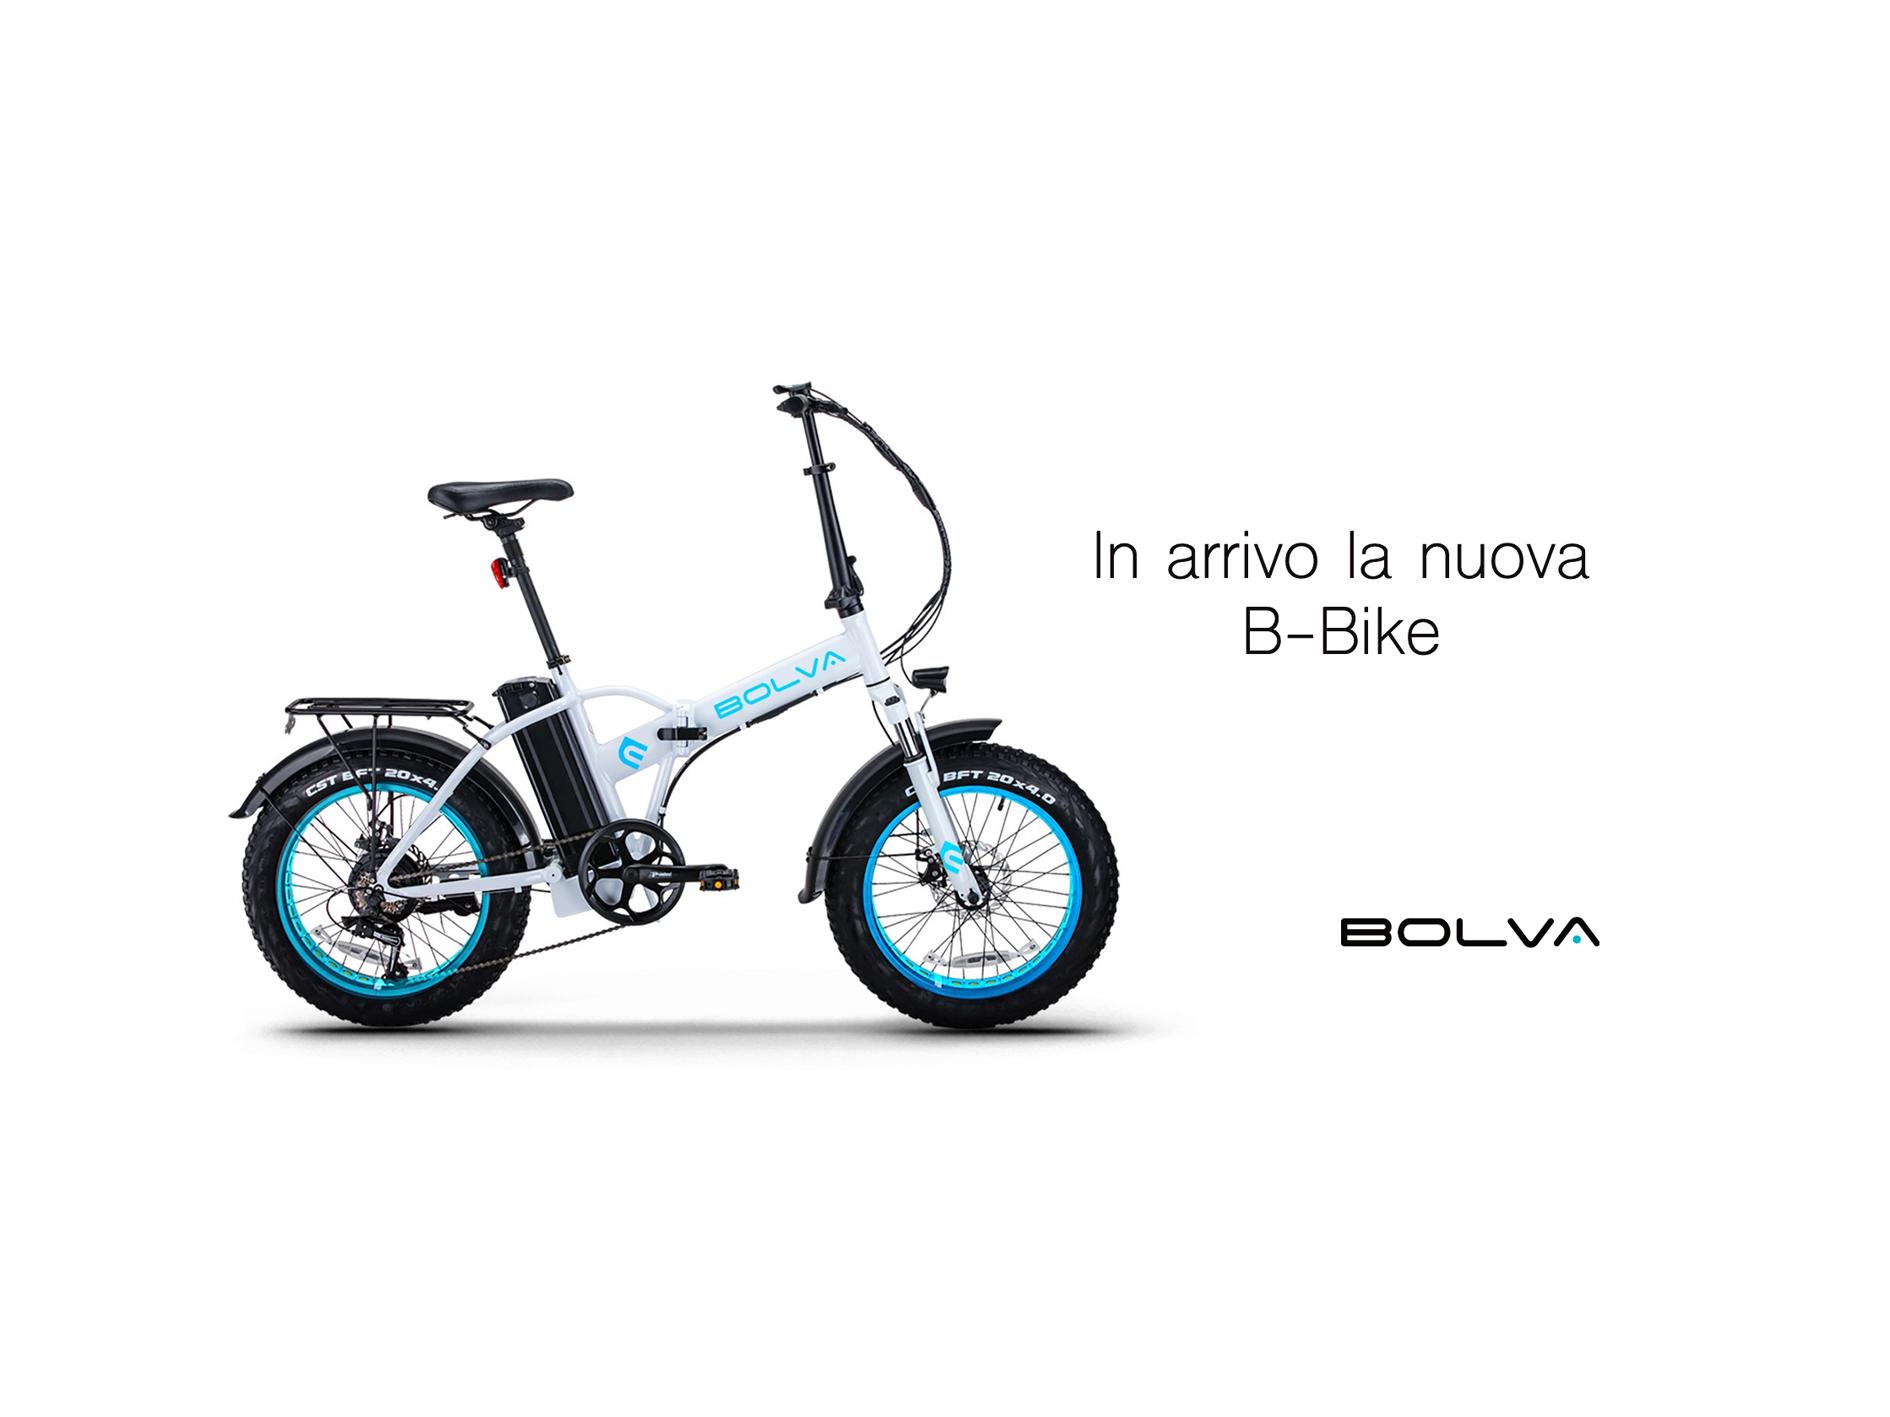 Bolva b-bike sito.jpg